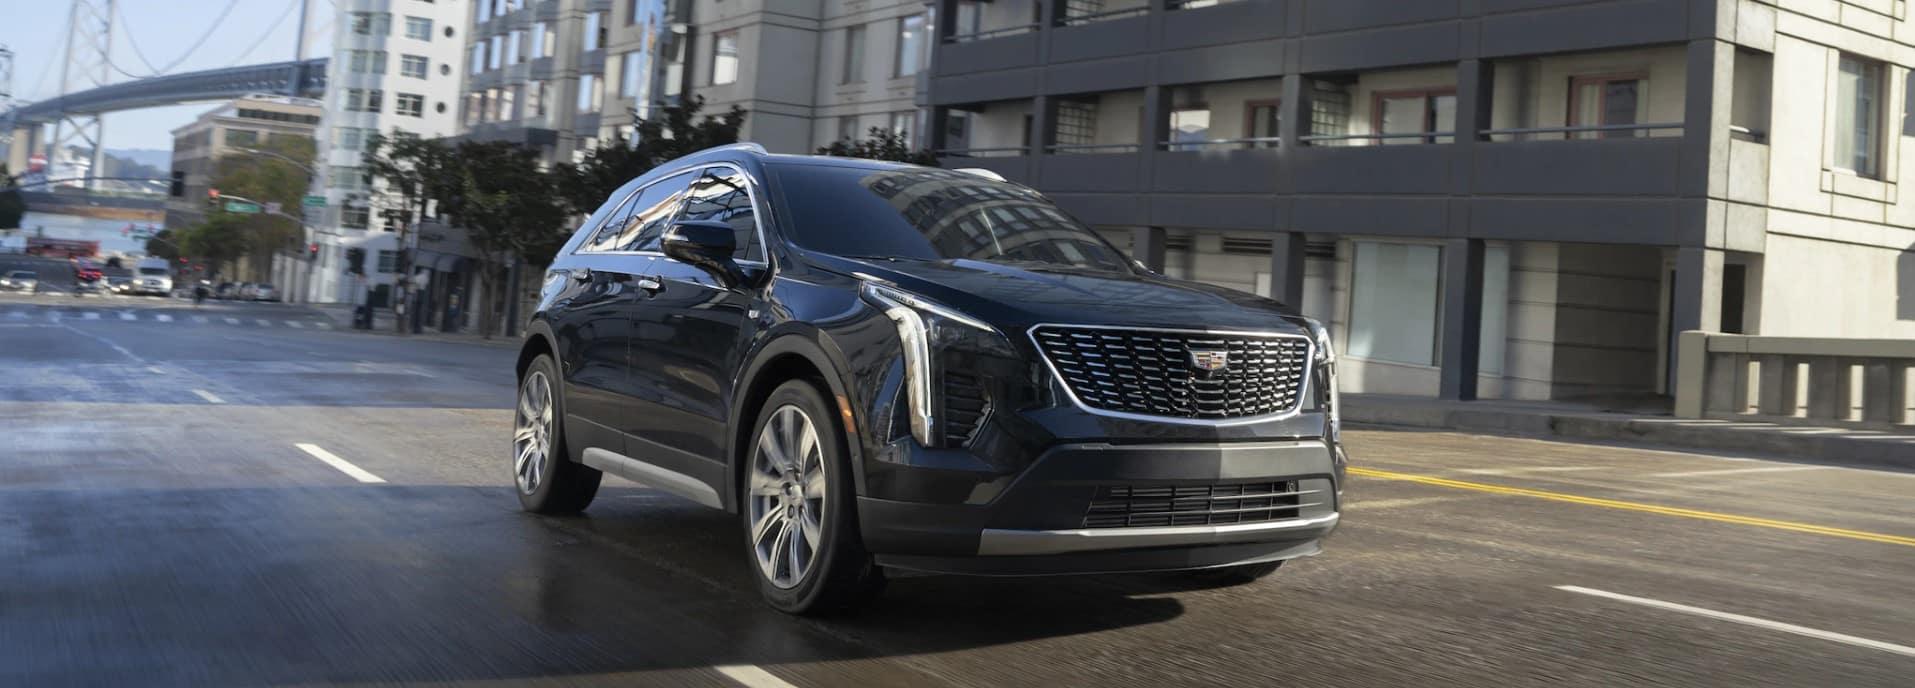 2021 Cadillac XT4 Exterior Design